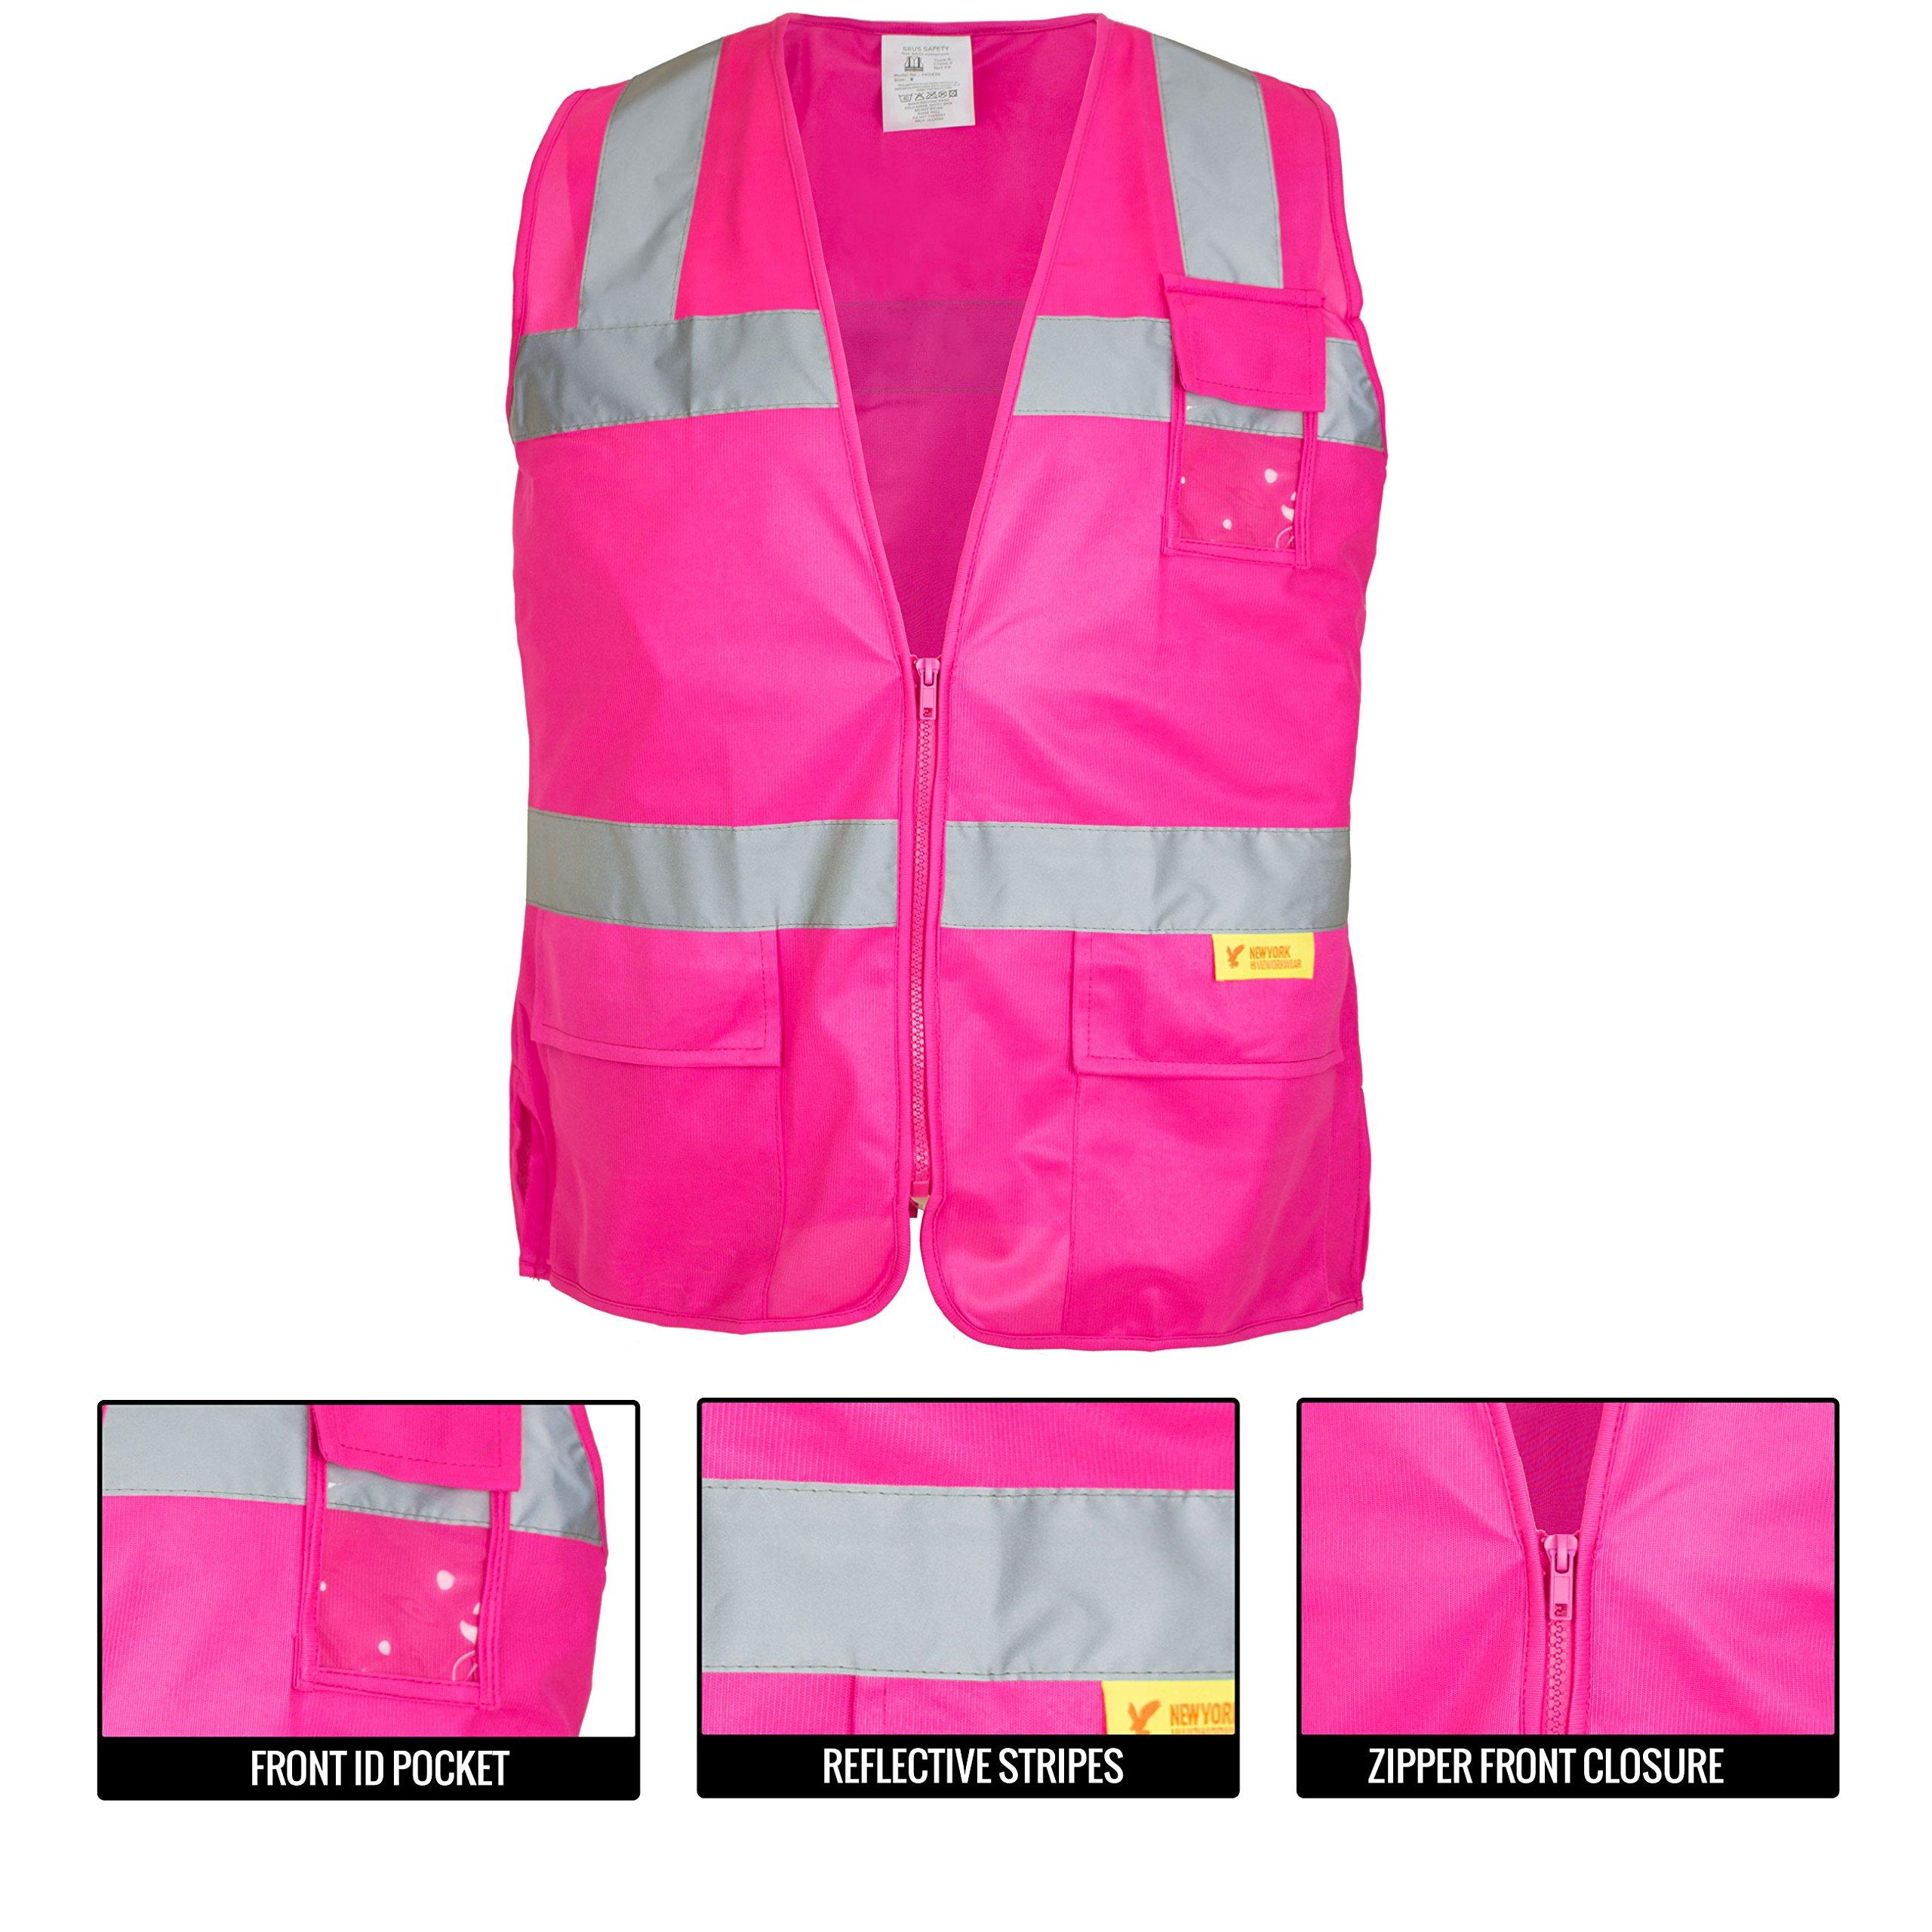 RK Safety PK0430 ANSI/ISEA Class 2 Certified Female Safety Vest (Pink, Medium) by New York Hi-Viz Workwear (Image #3)